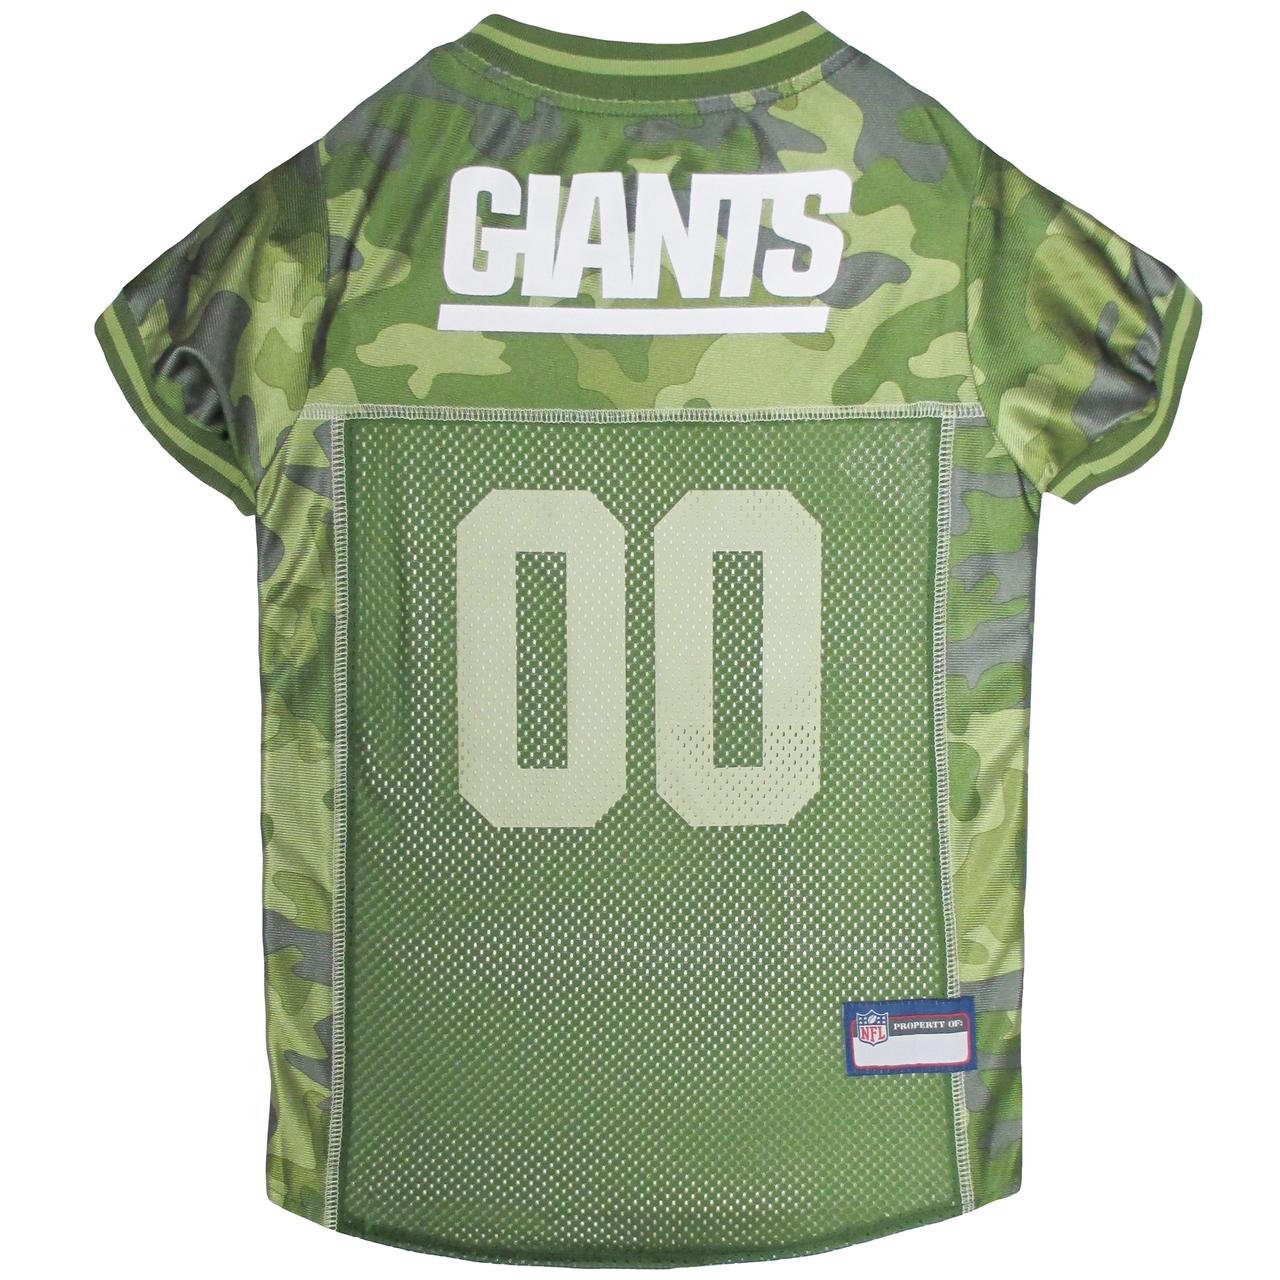 Hot Dog N.Y. Giants NFL Football Camo Pet/ Dog Jersey